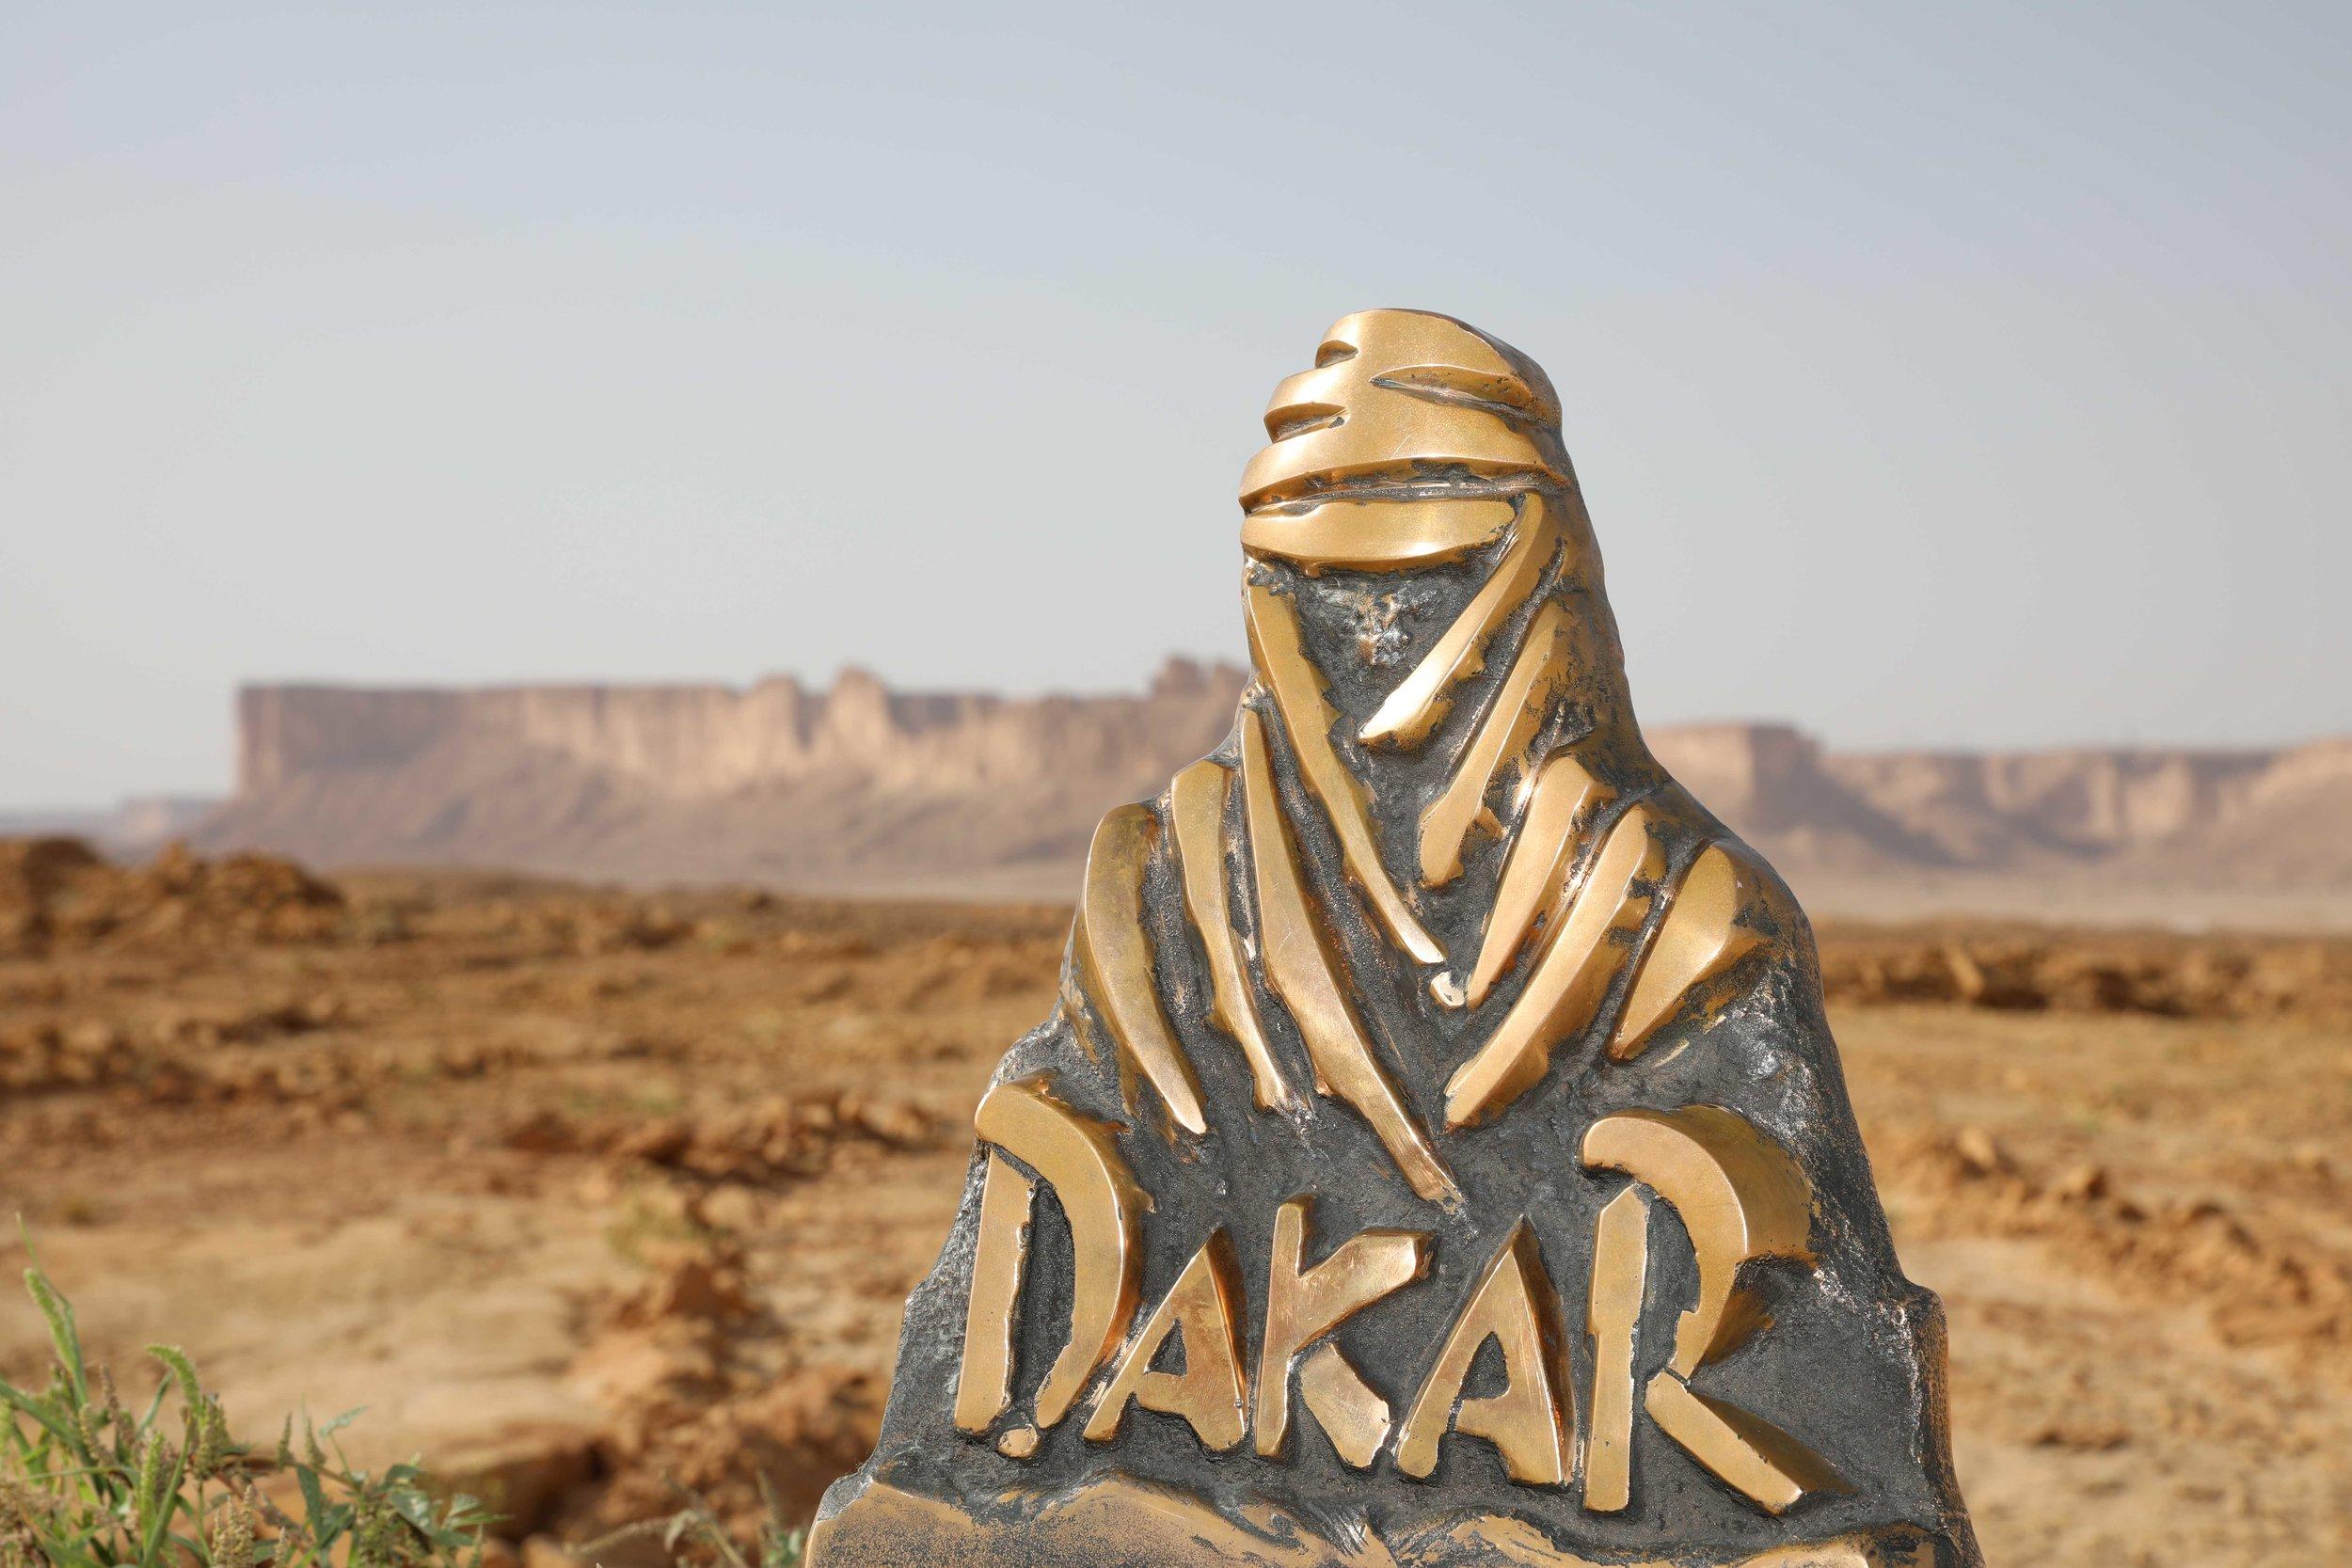 Saudi Arabia will be host to the Dakar Rally in January 2020. Photo courtesy of the General Sports Authority (GSA), Kingdom of Saudi Arabia.